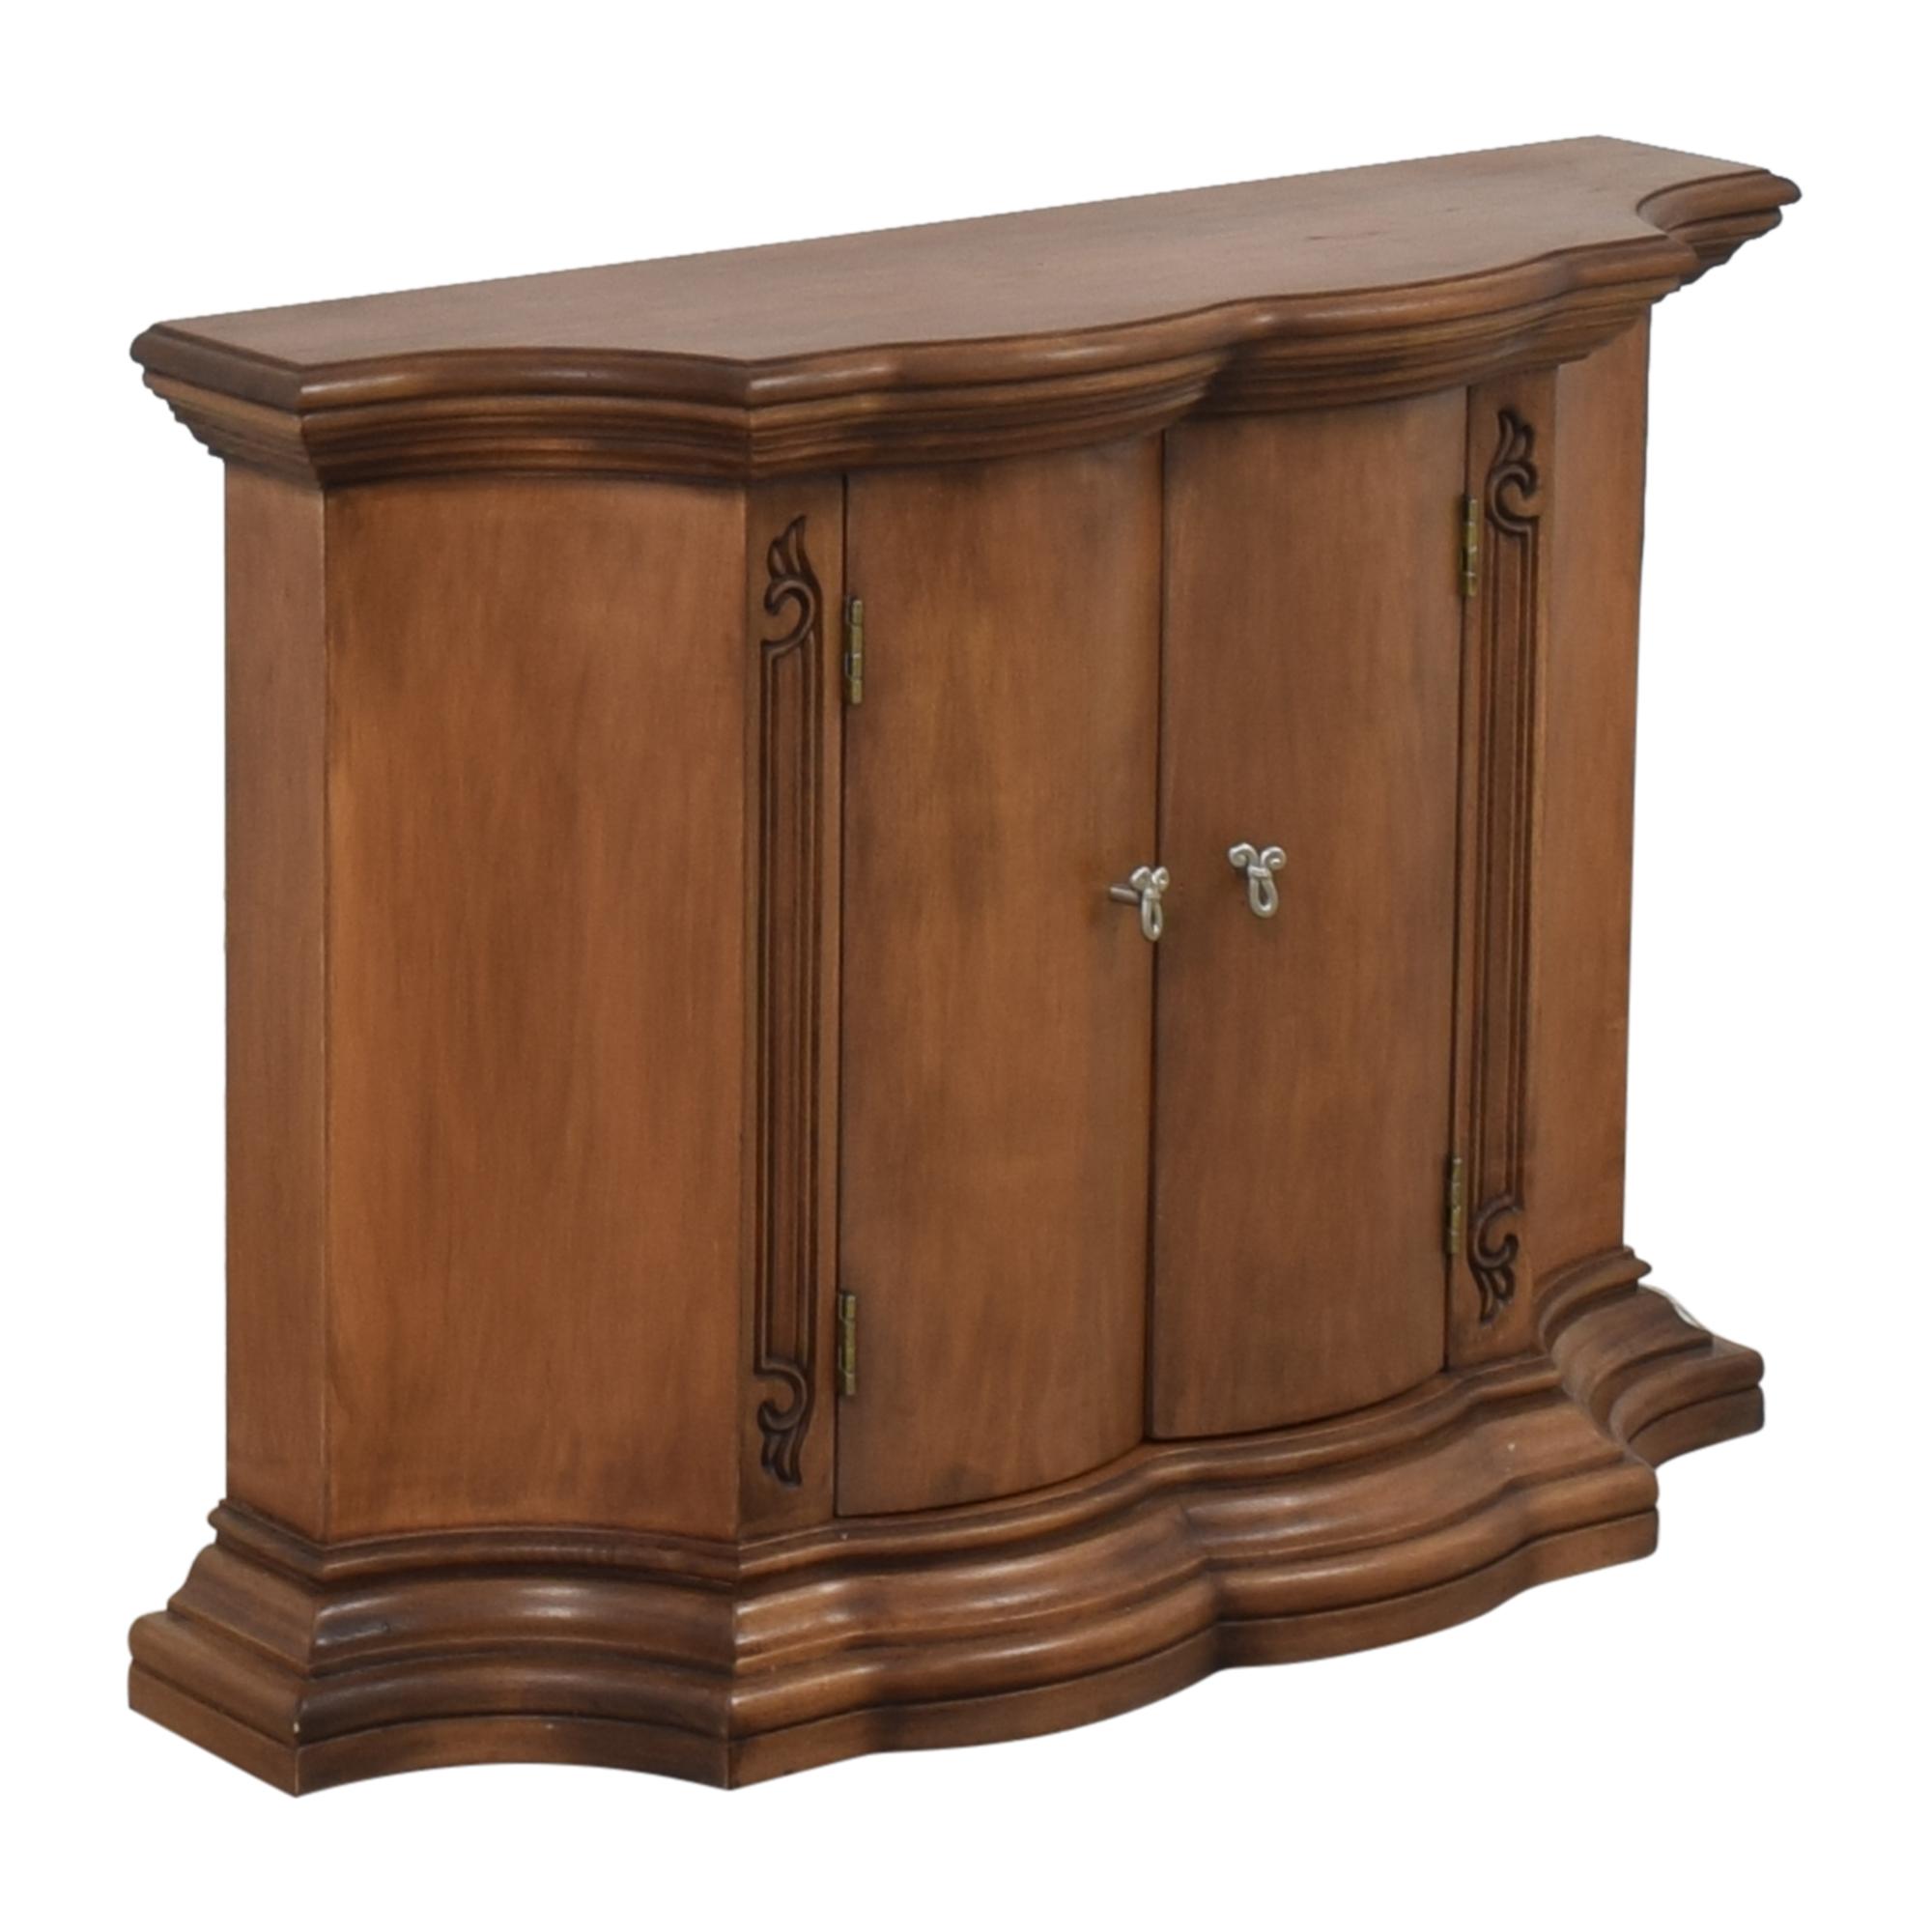 buy Drexel Drexel Vintage Sideboard Cabinet online